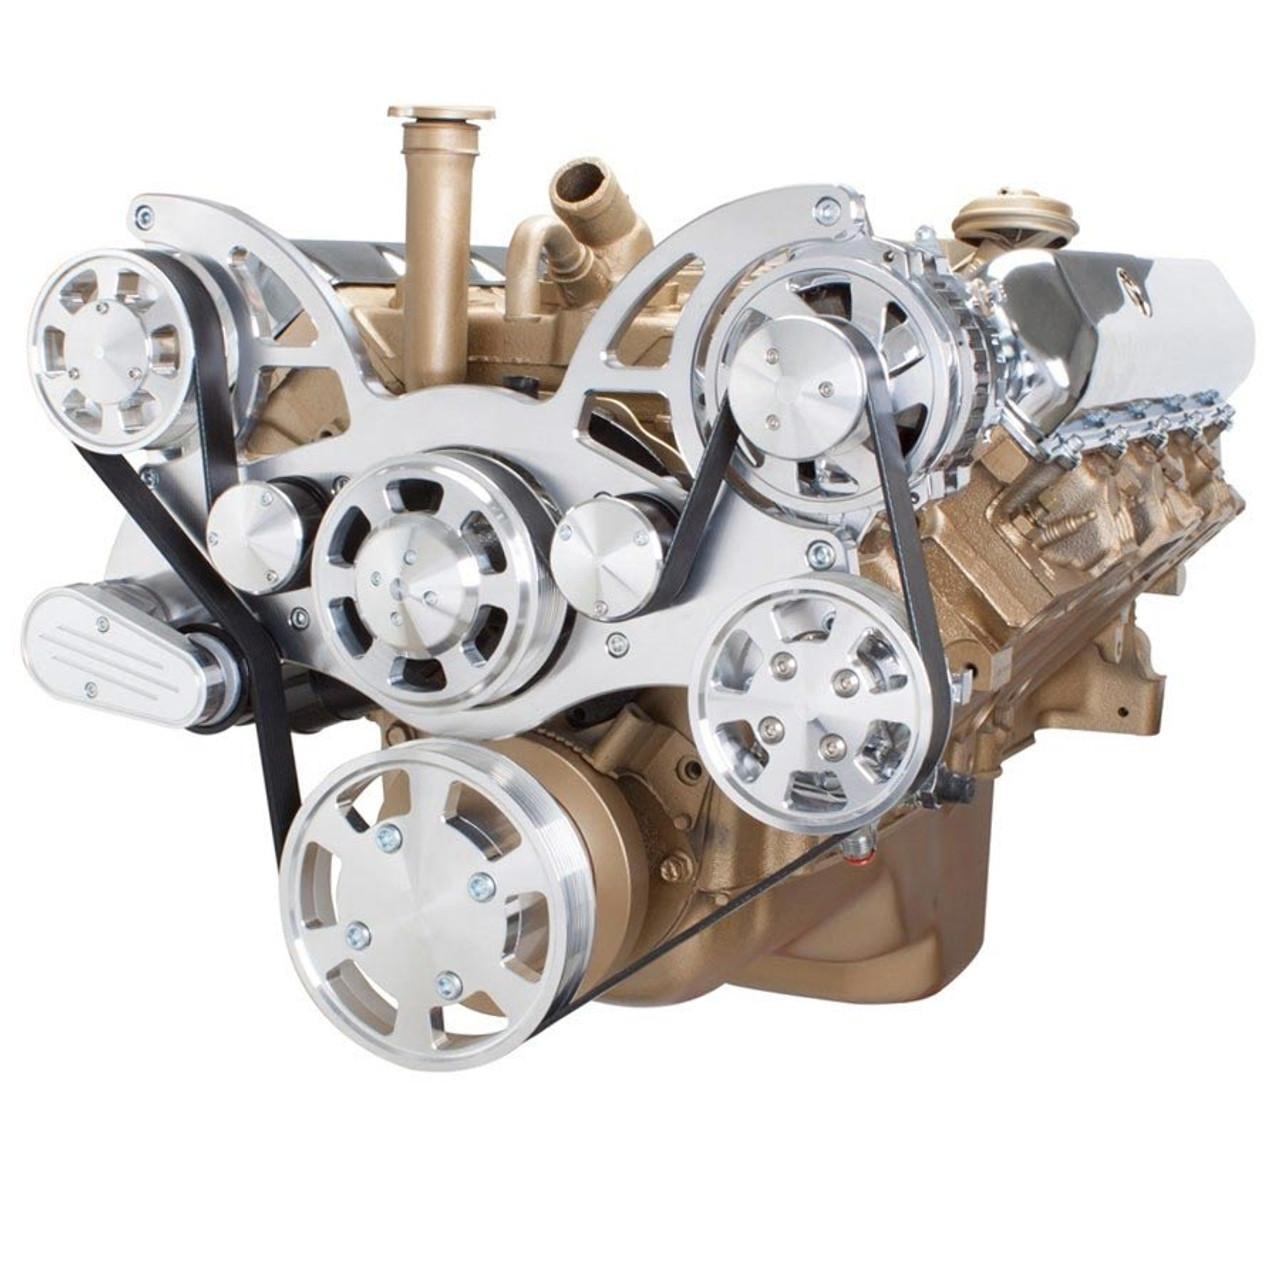 hight resolution of serpentine system for oldsmobile 350 455 power steering alternator